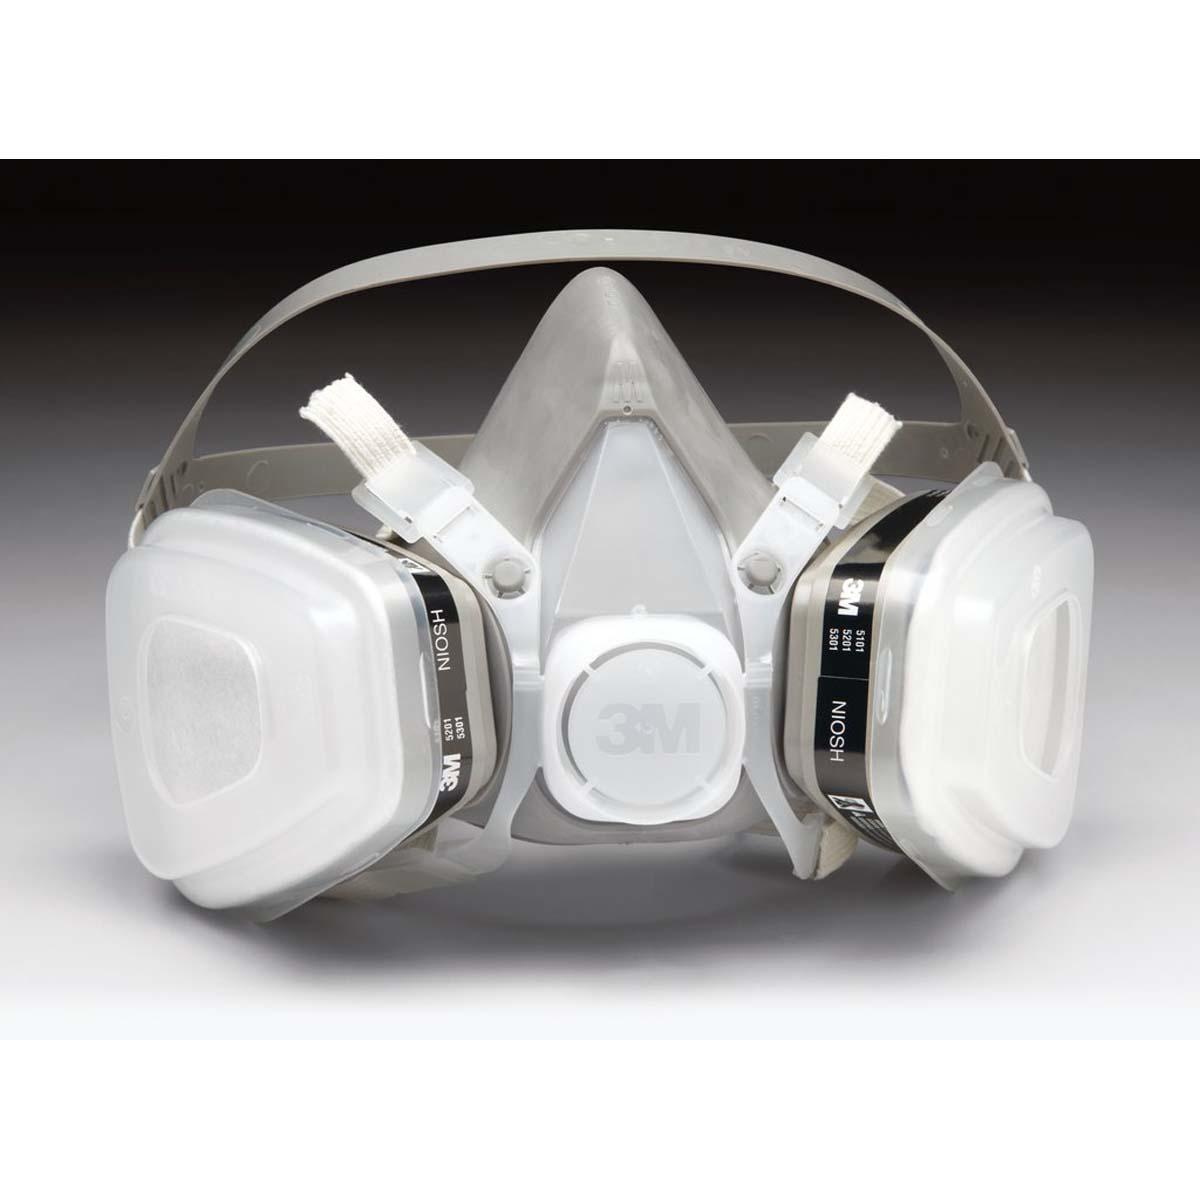 "3Mâ""¢ Half Facepiece Disposable Respirator Assembly 51P71, Organic Vapor/P95, Small"